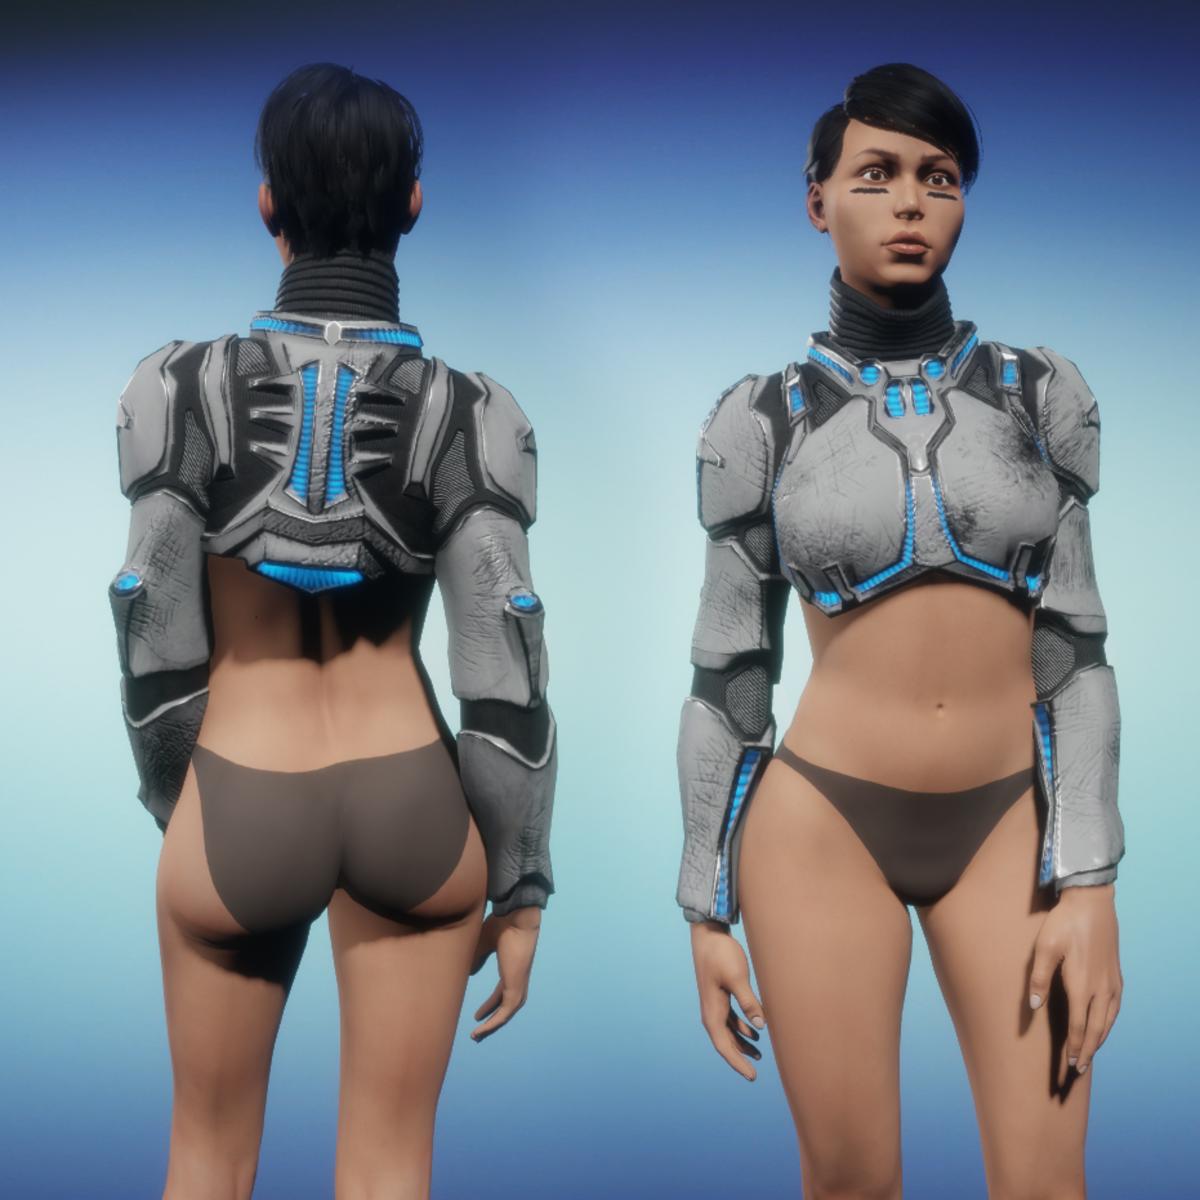 Sci-Fi Armor Top part 1/2 (white)